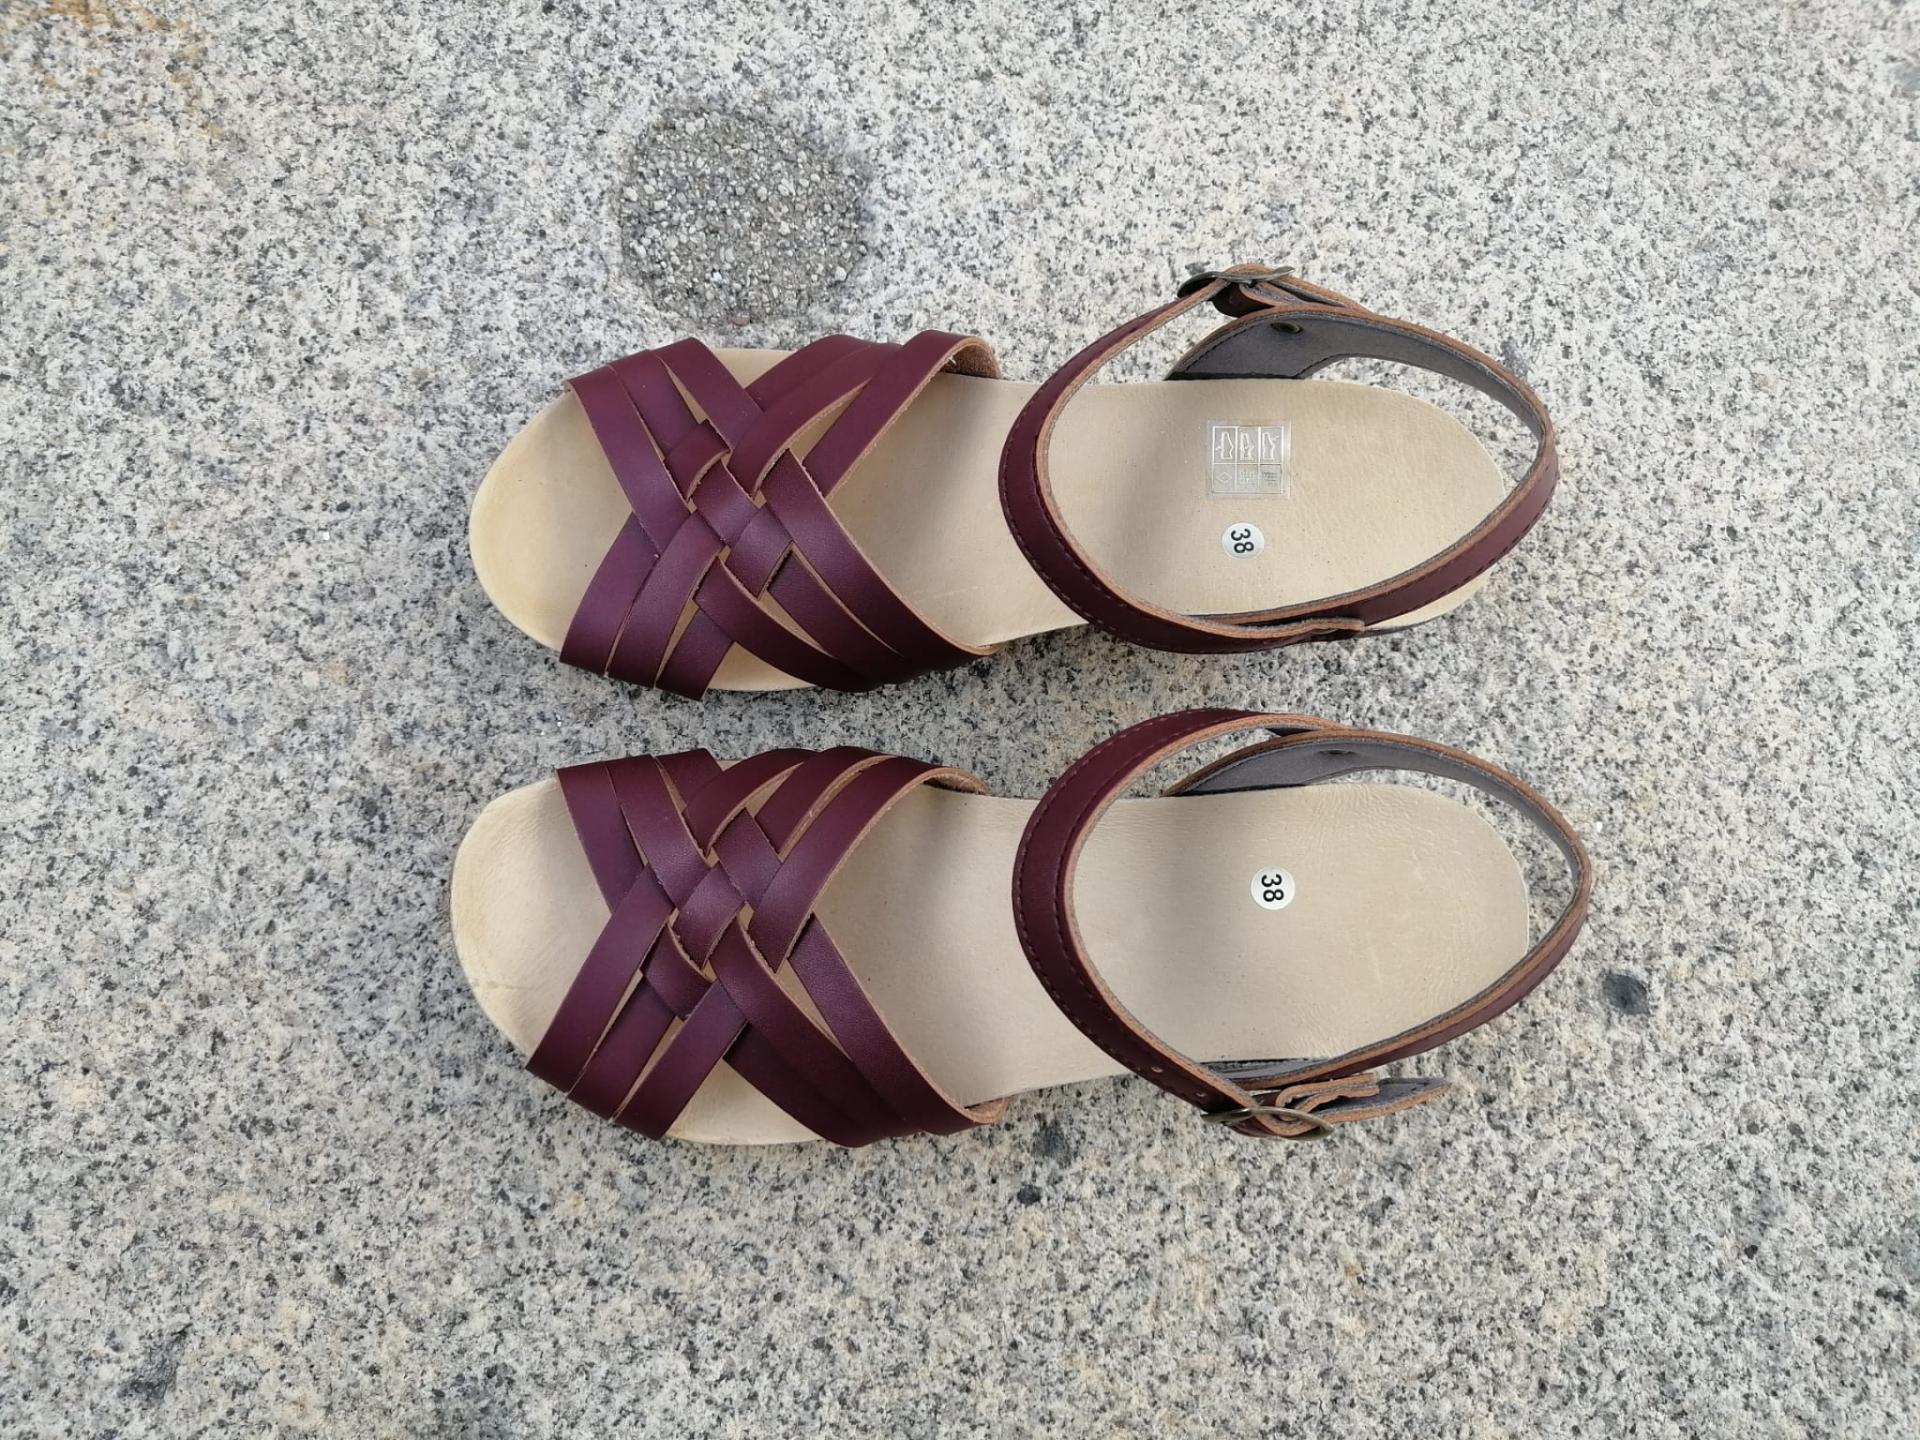 Edición limitada: OSUNA BURDEOS, sandalias veganas, sandalias veganas mujer, calzado vegano, sandalias de tacón medio, sandalias bioworld, vegan shoes, sandalias burdeos.